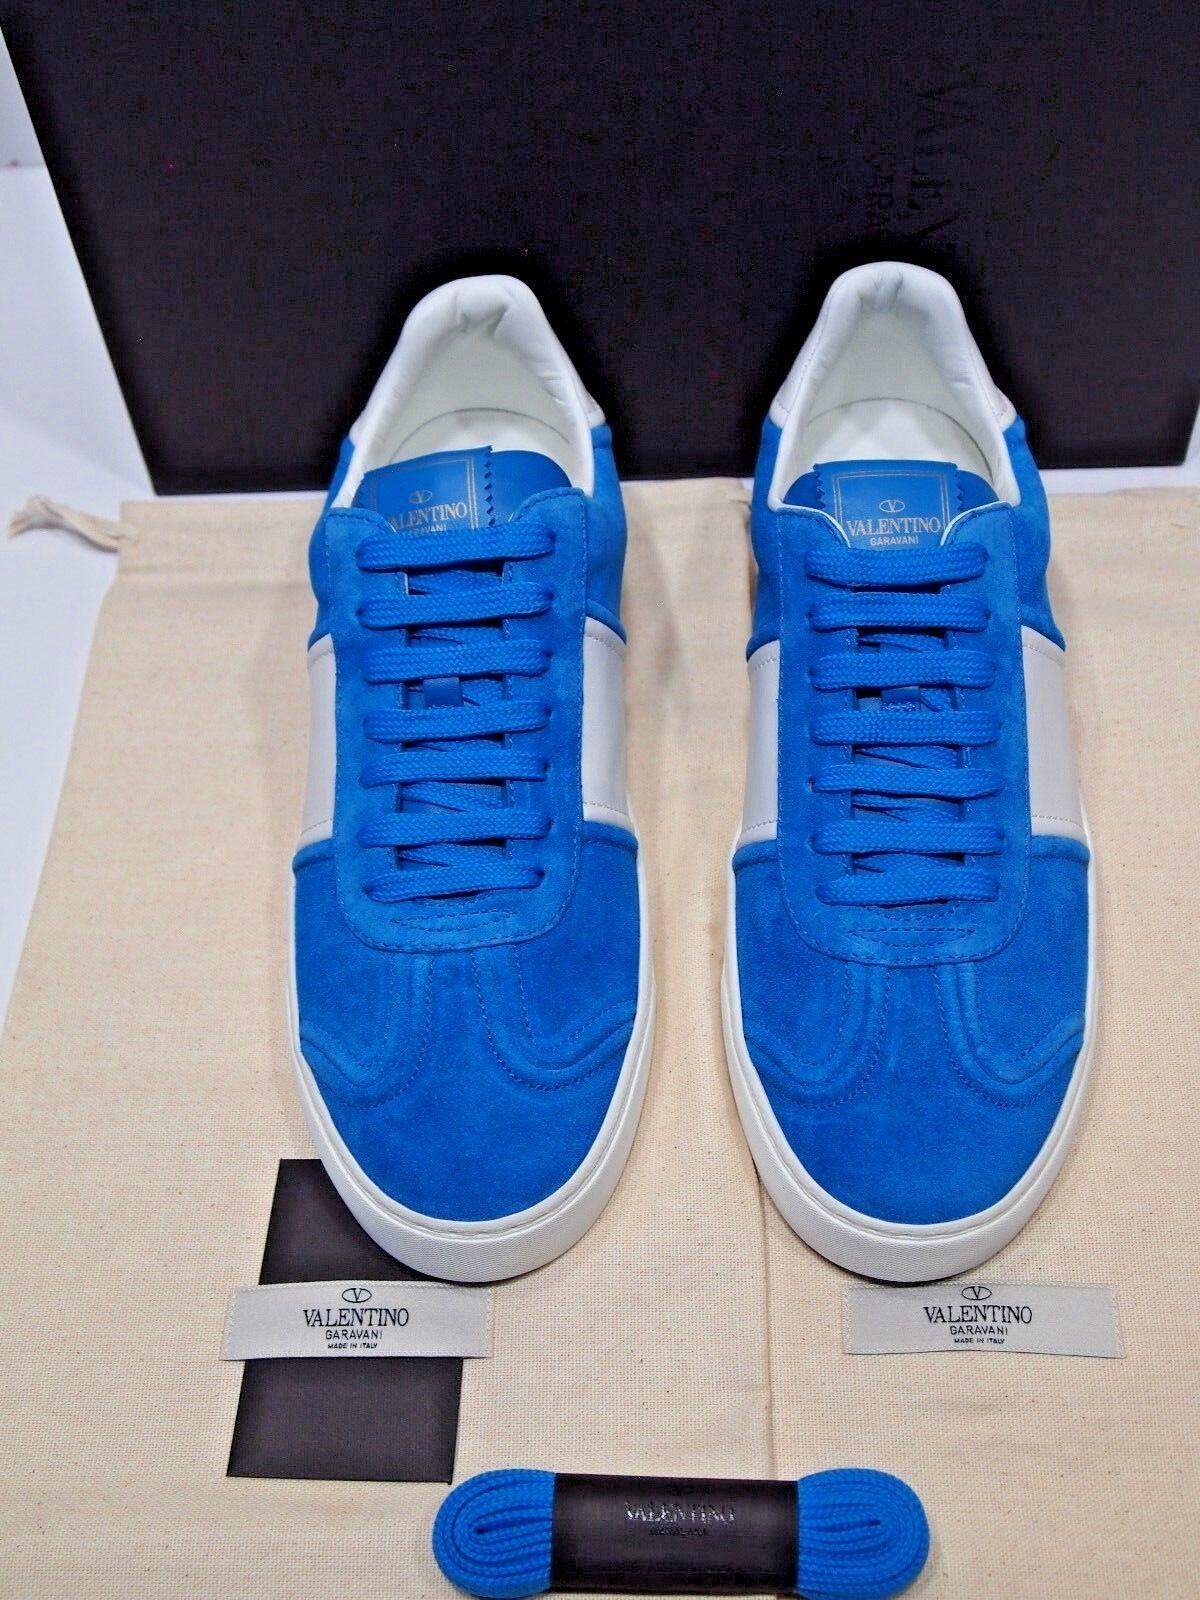 Valentino Homme Garavani Fly Crew Daim rockstud Faible-top paniers Bleu 42 9 US